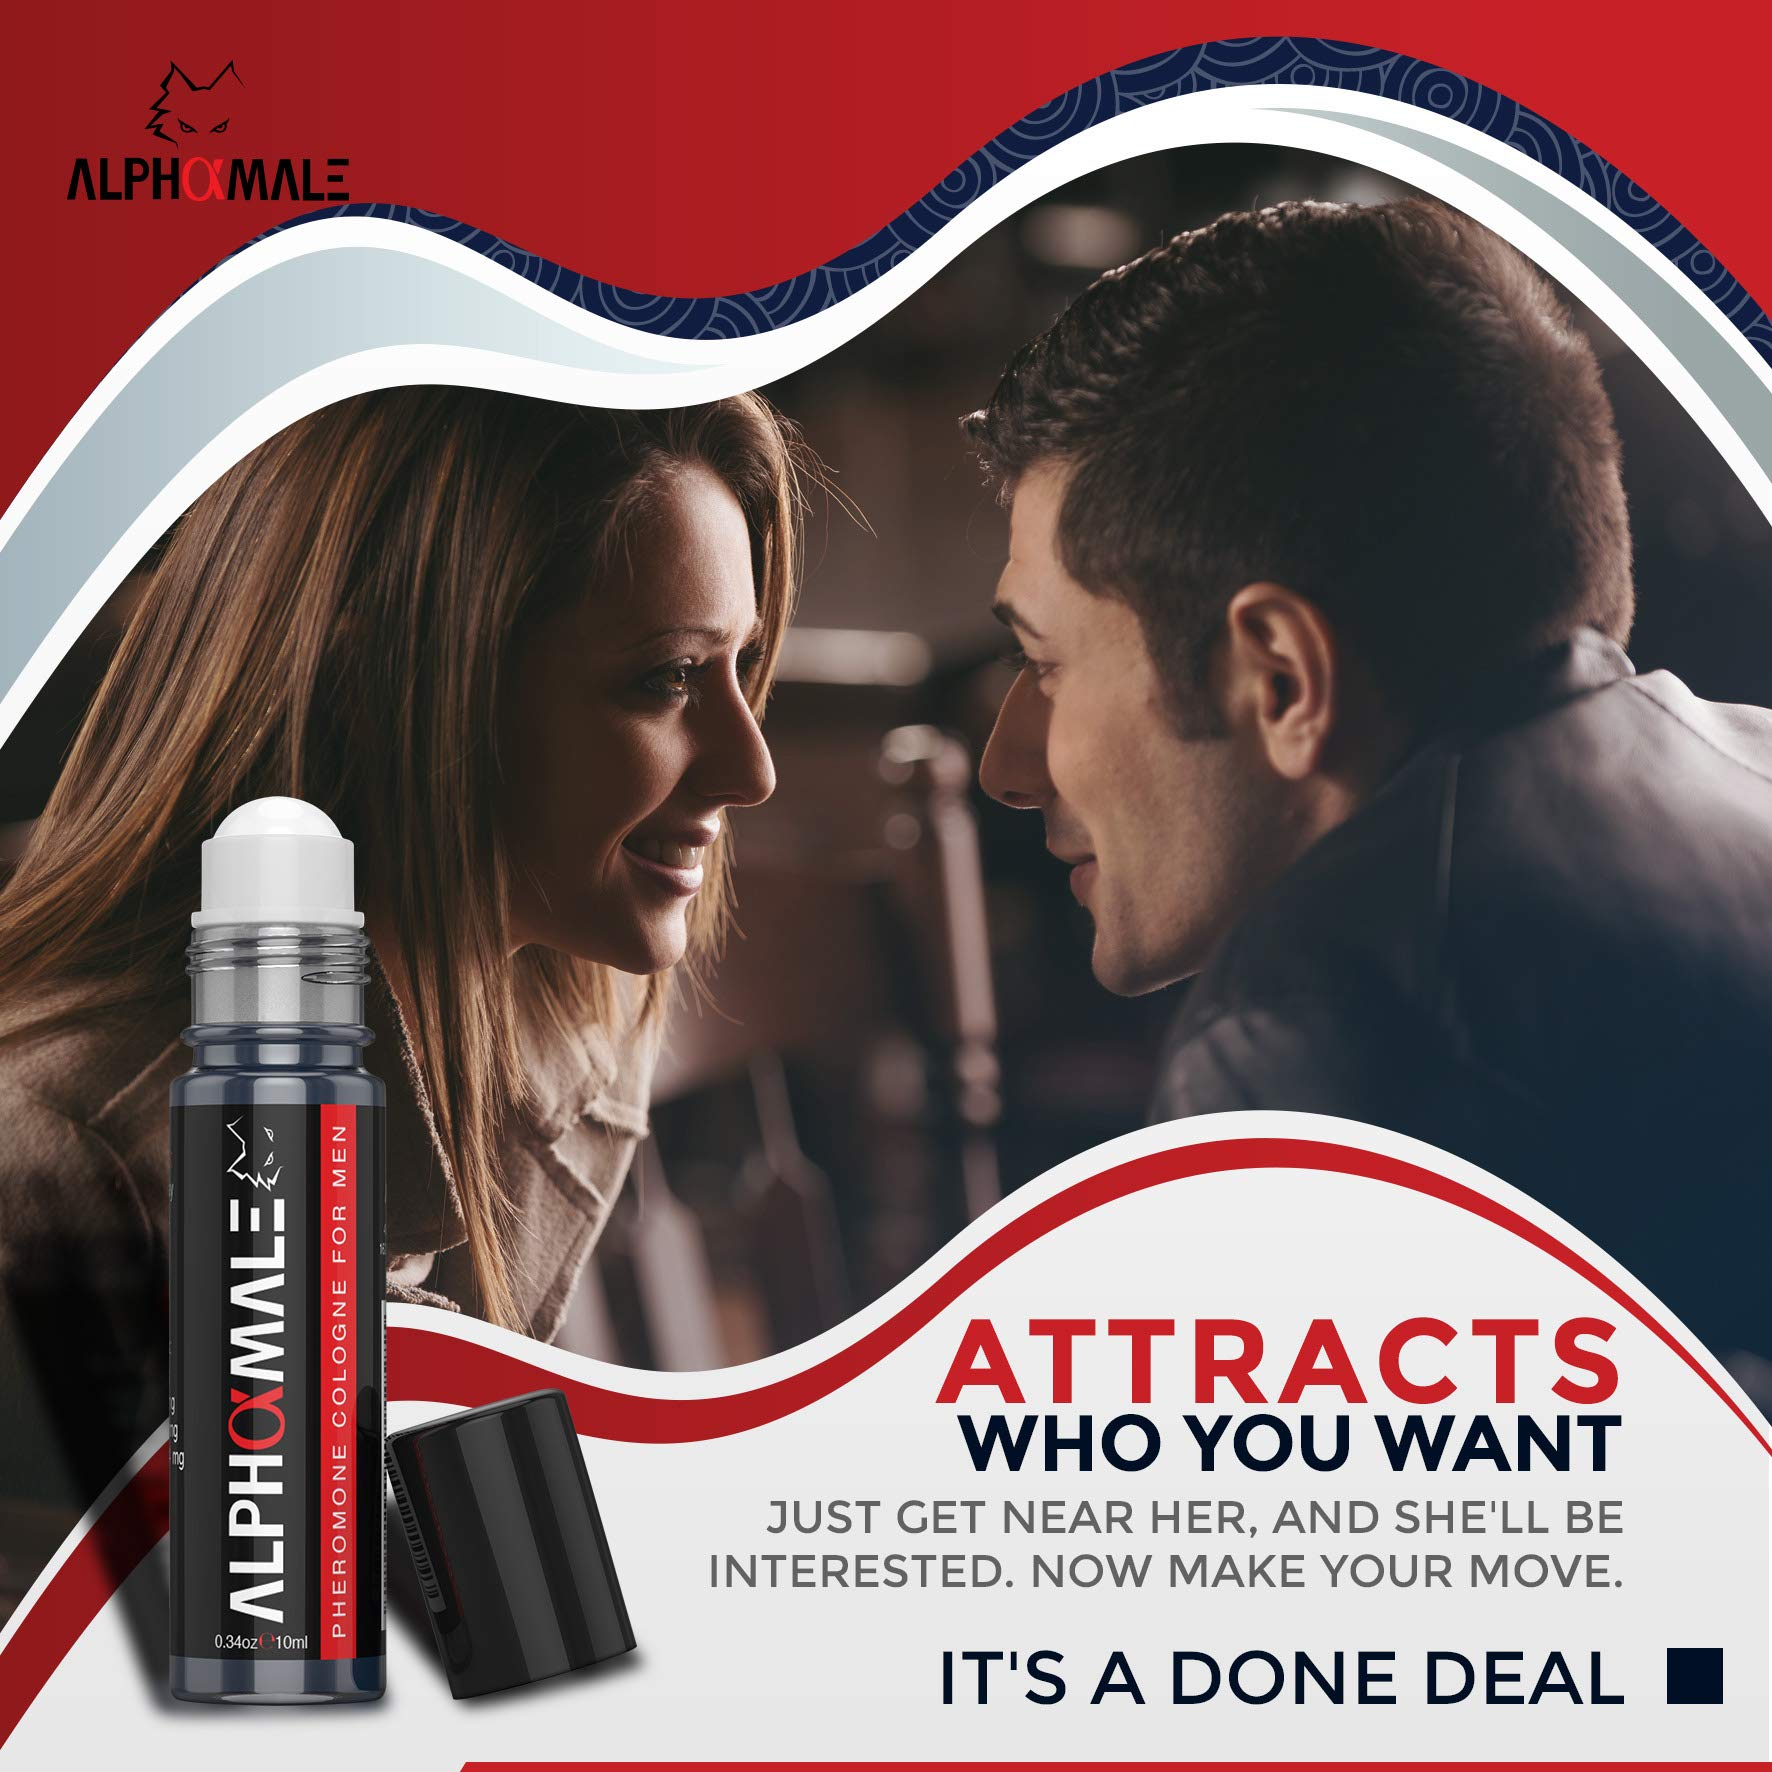 Premium Pheromone Cologne for Men - AlphaMale - Attraction Perfume for Men to Attract Women